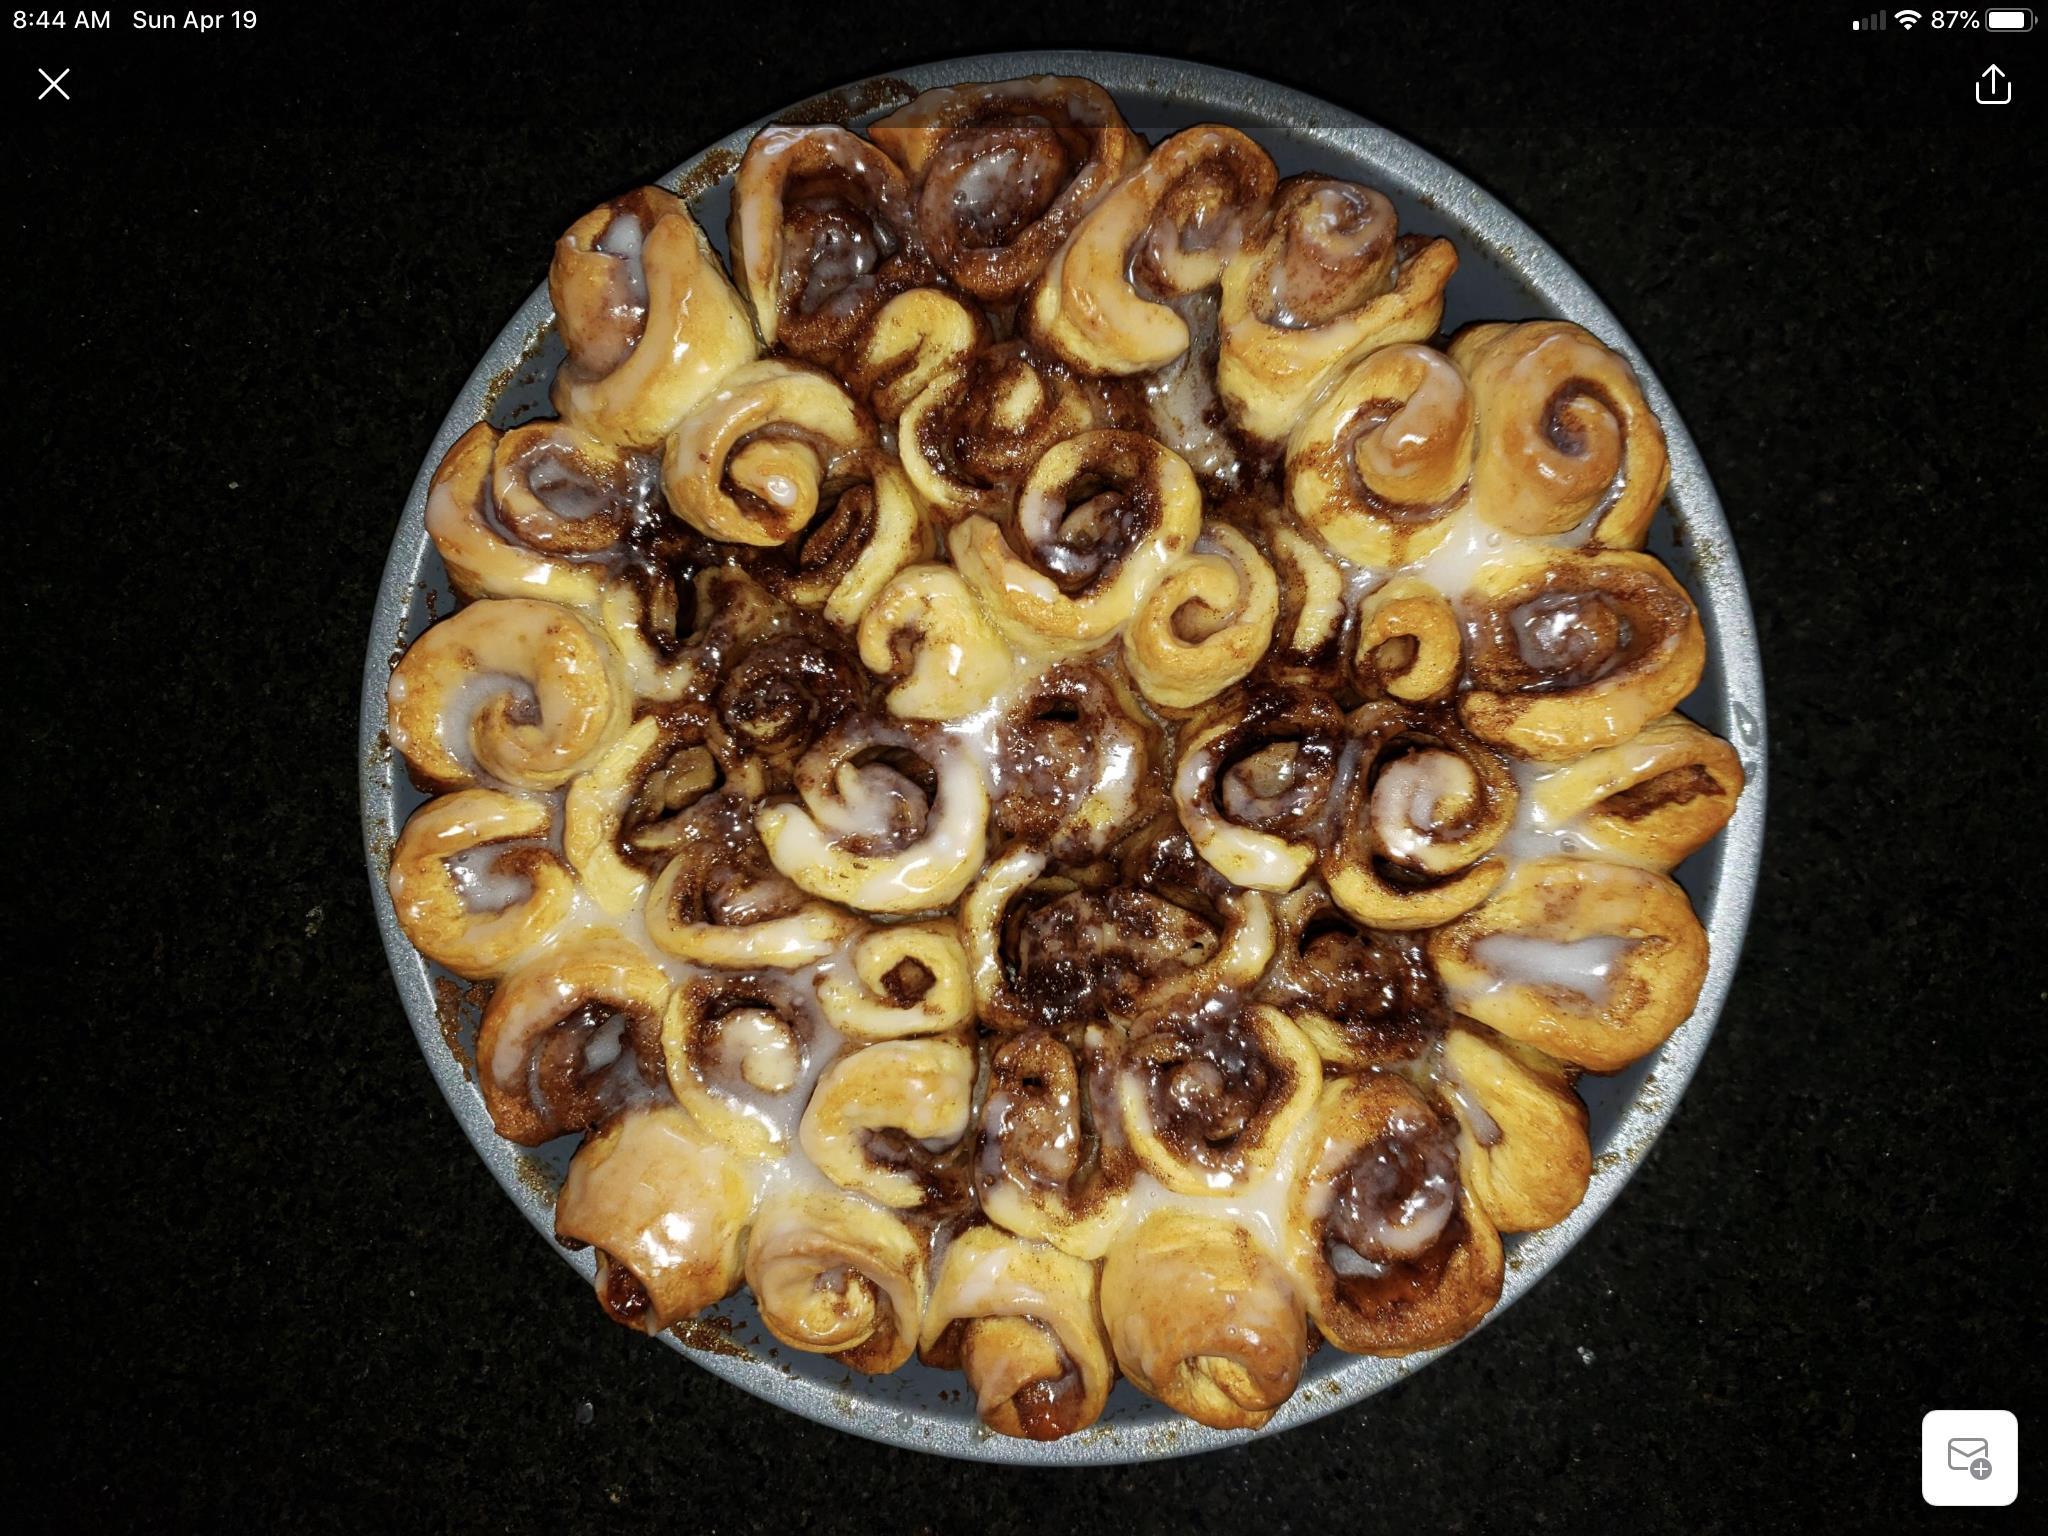 Biscuit Cinnamon Rolls Duane Canter